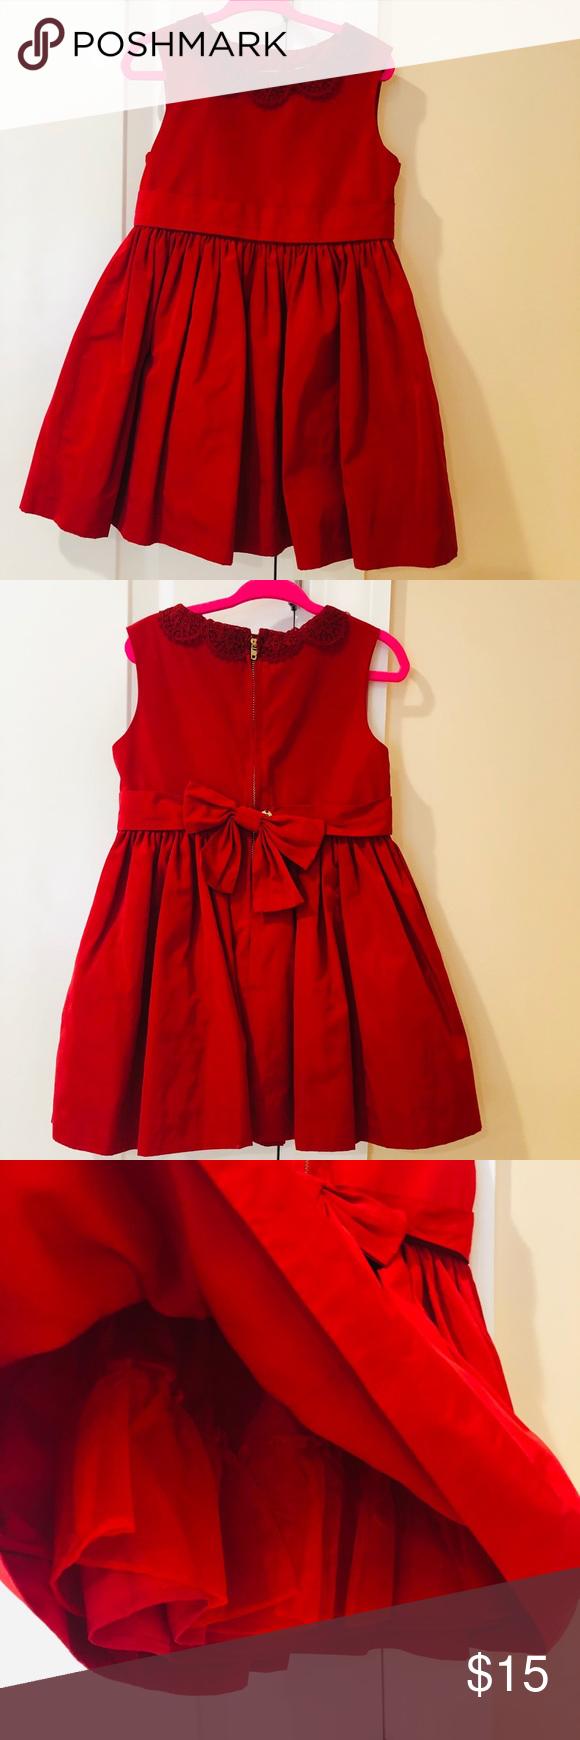 Jason Wu For Target Girls Dress Target Girls Girls Dresses Kids Dresses [ 1740 x 580 Pixel ]